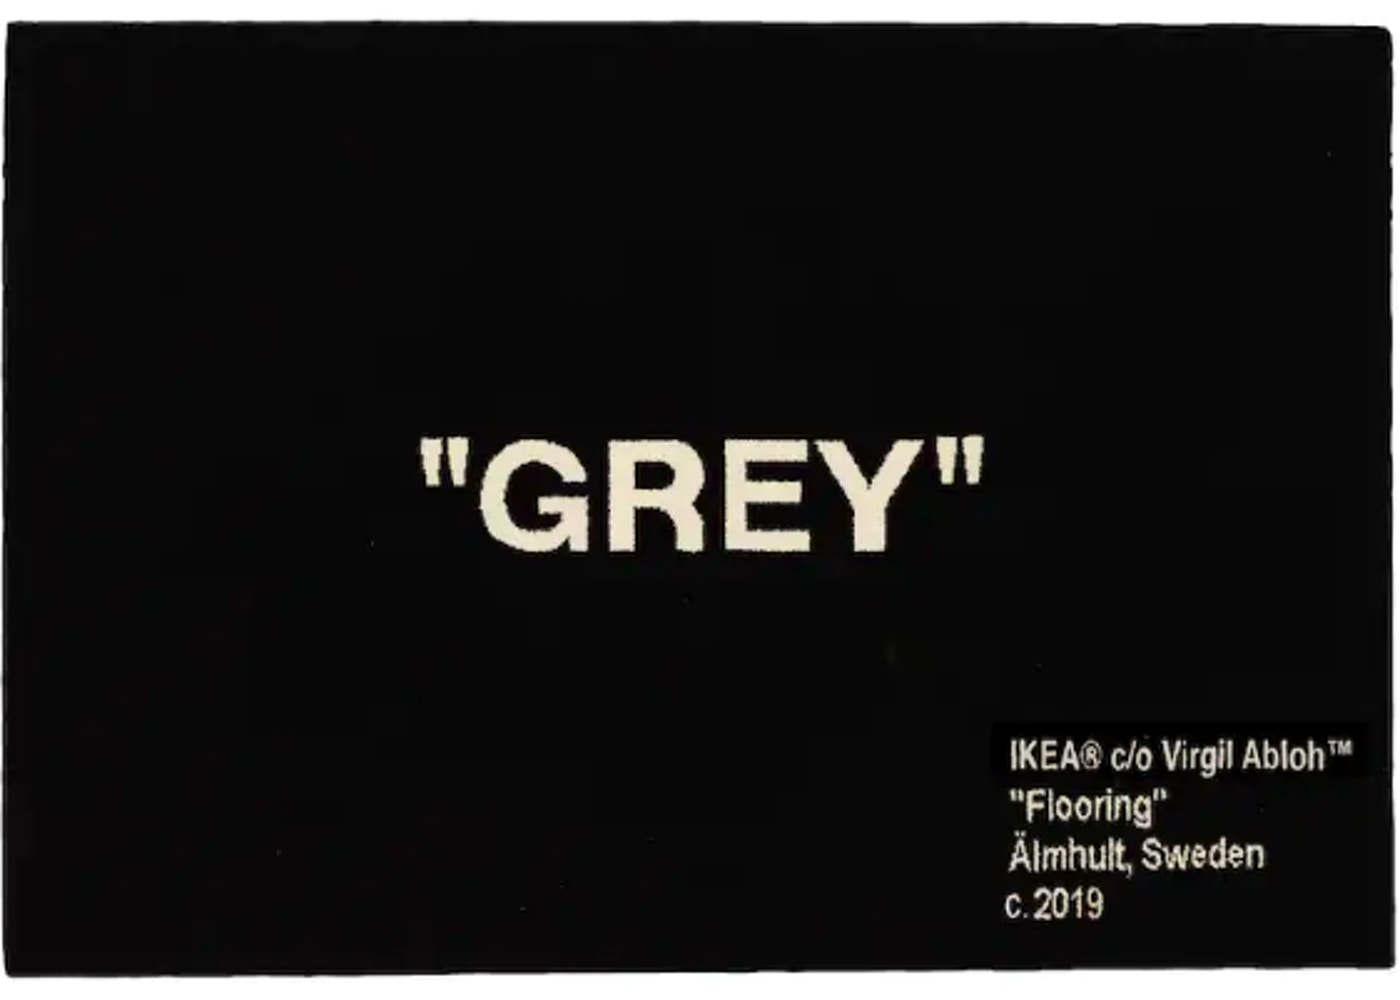 OFF-WHITE-Ikea-Grey-Rug-Black